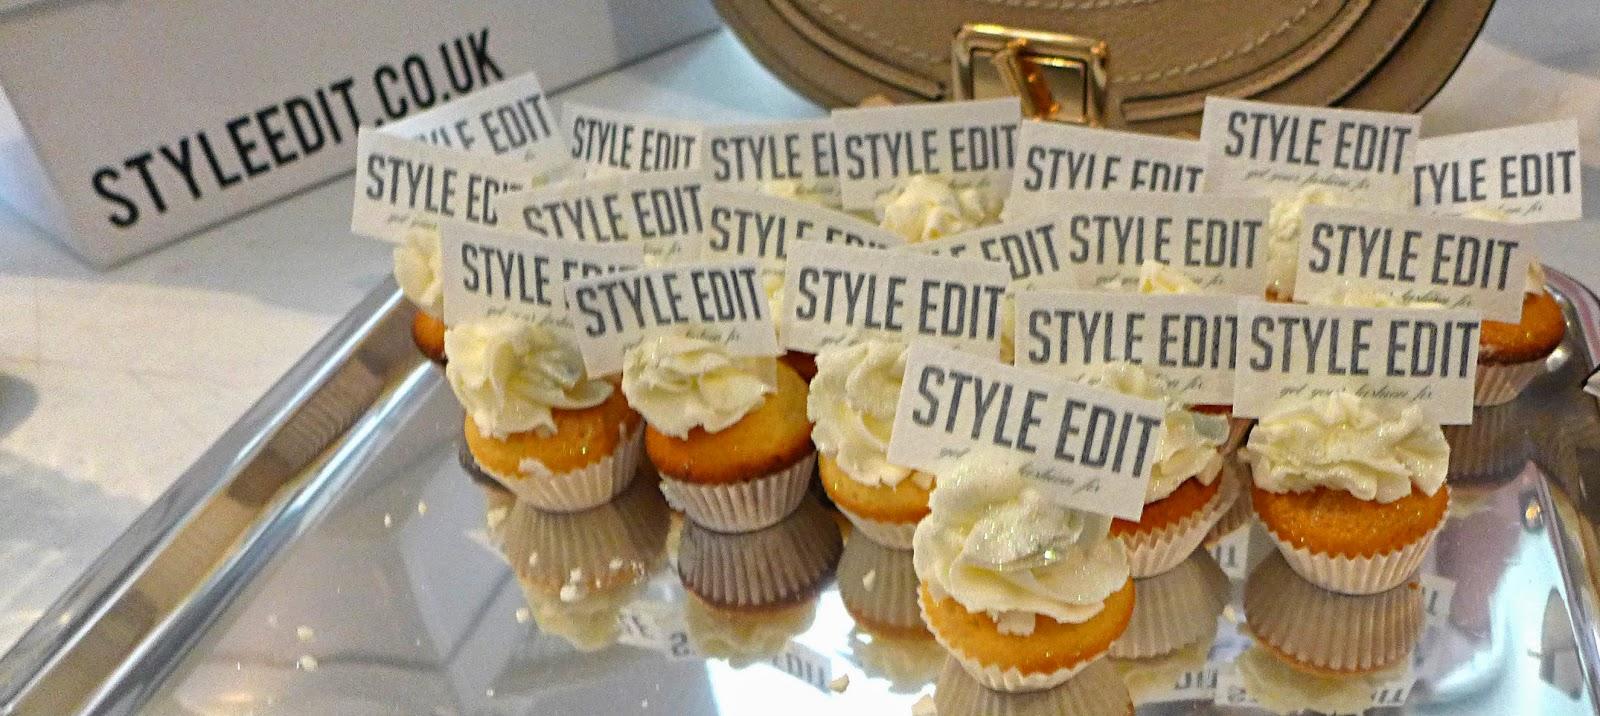 Style Edit Cupcakes